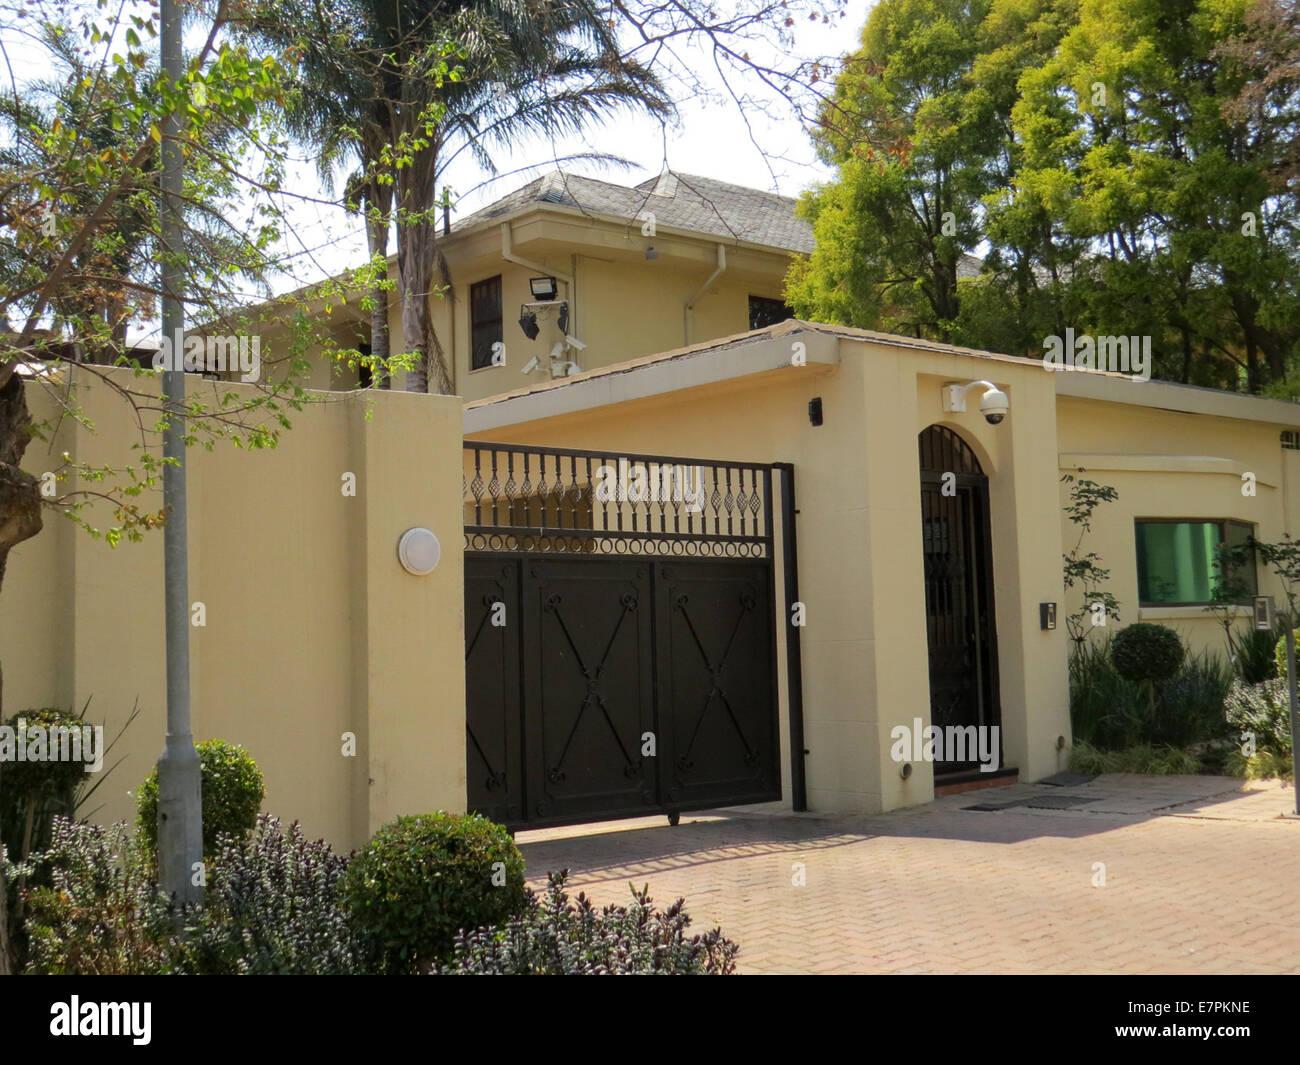 Present Houses In Joburg Zion Star